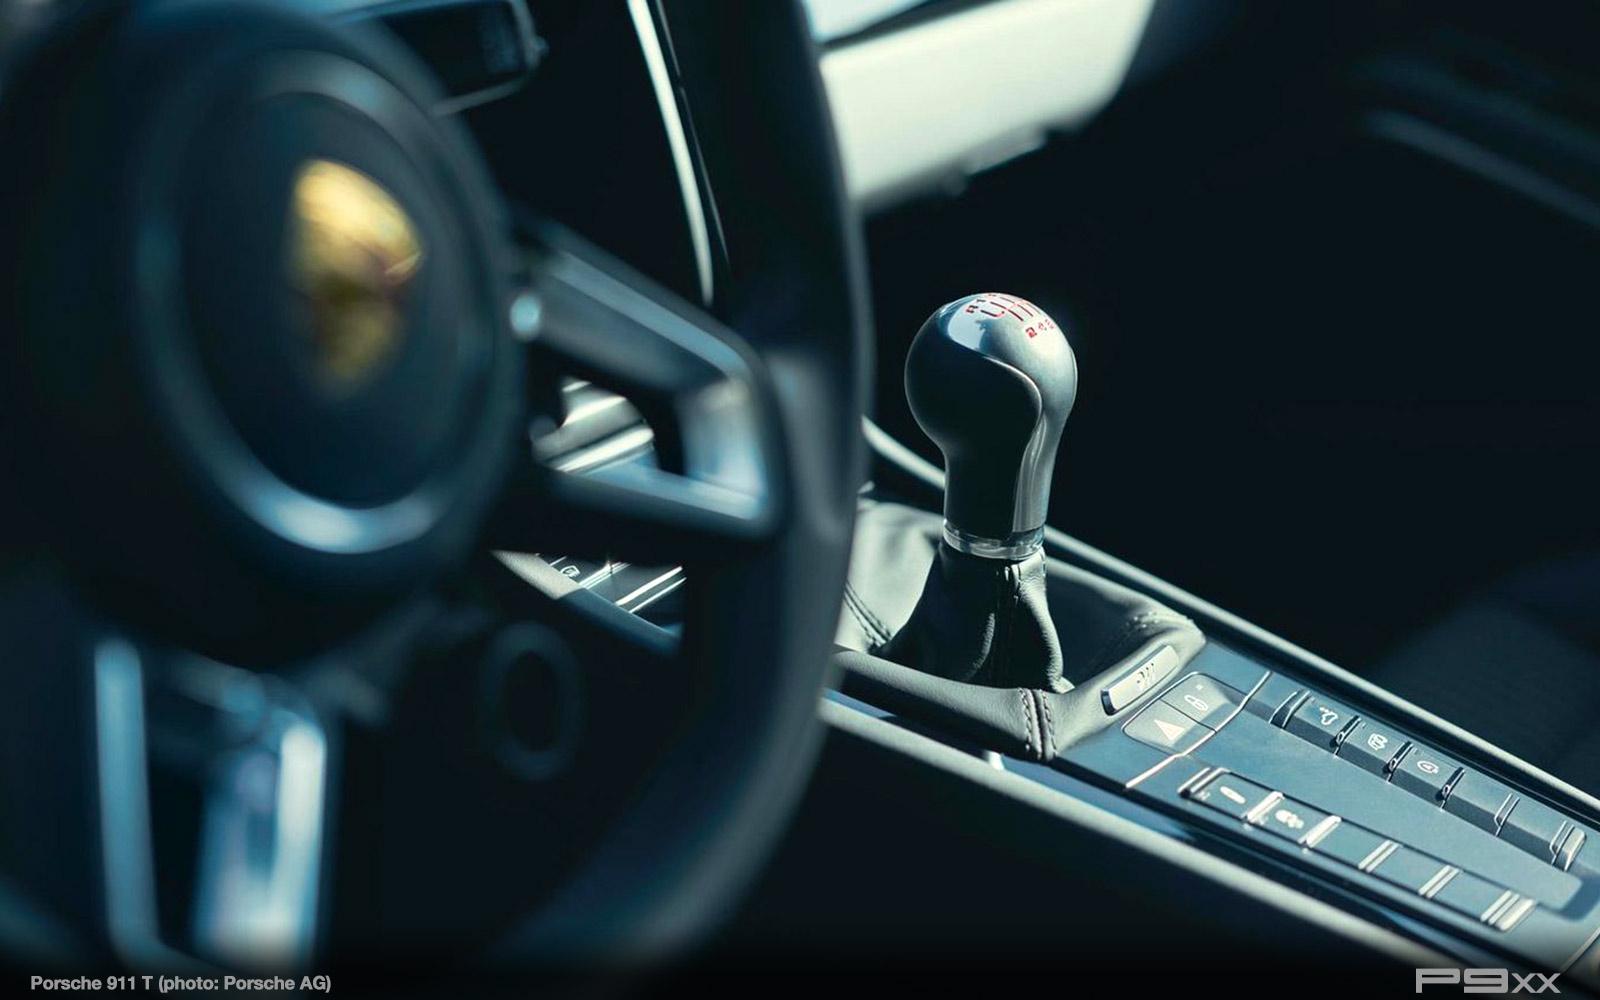 Porsche-911-Carrera-T-349